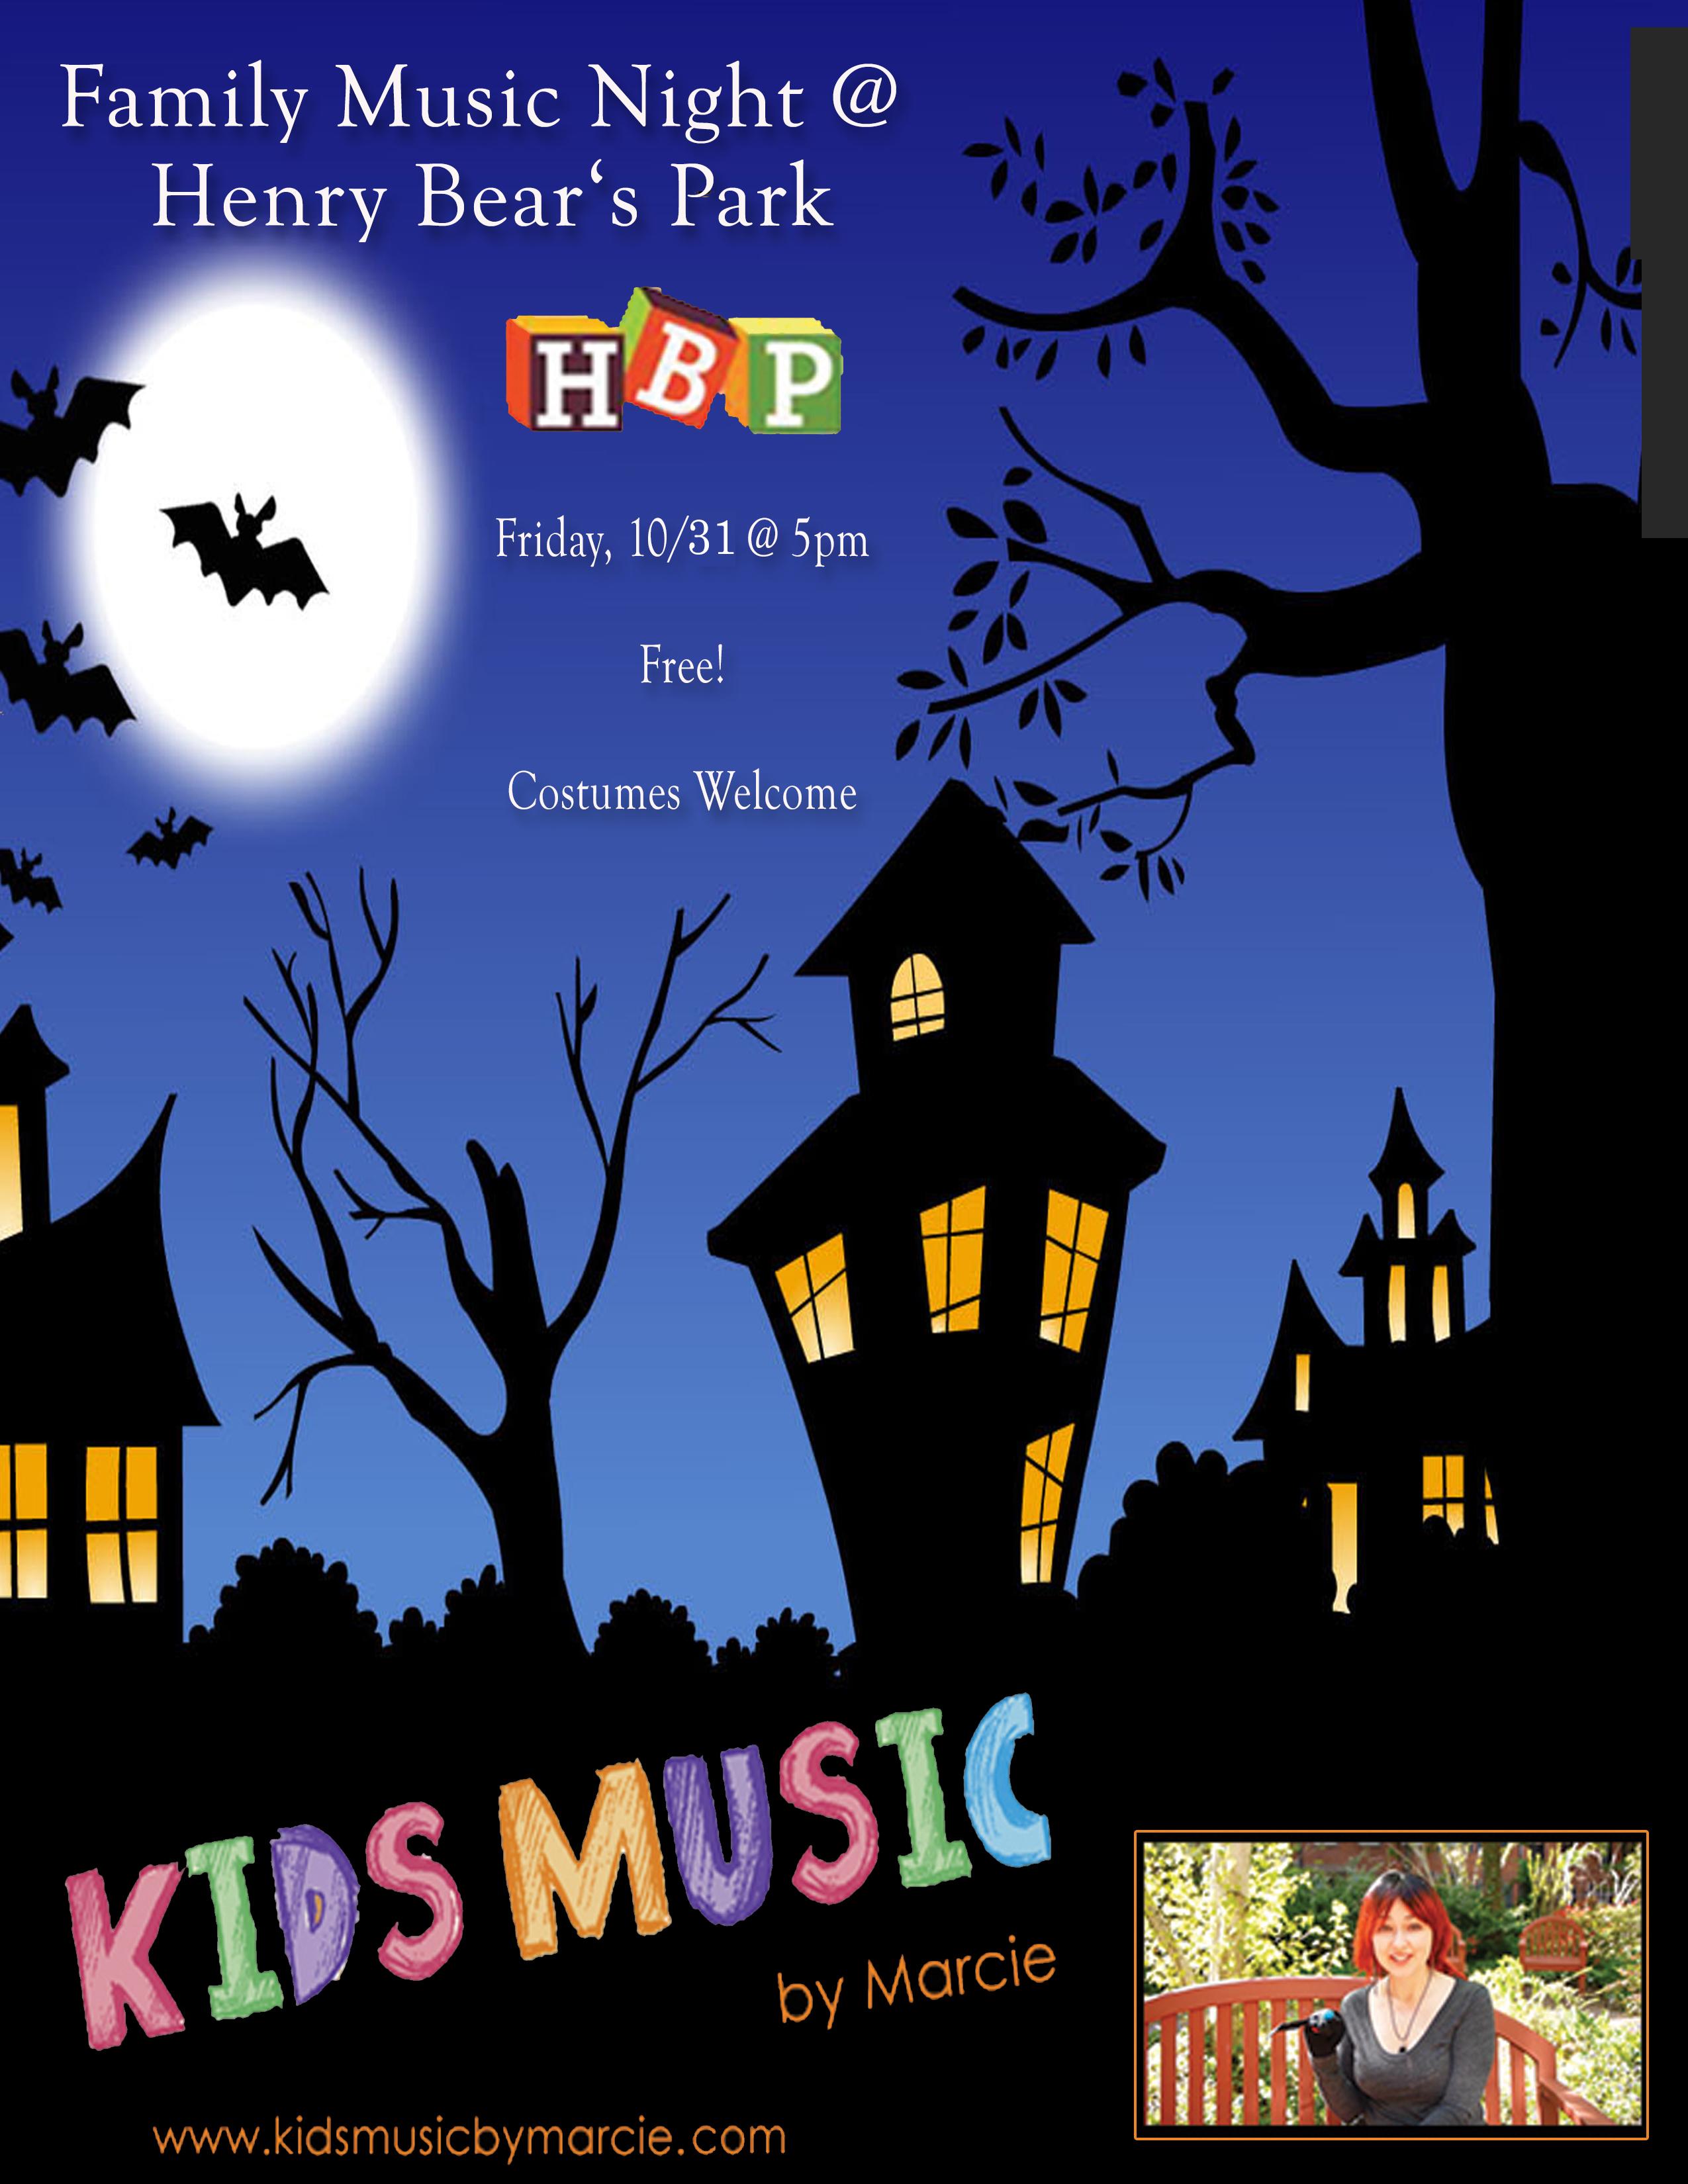 fun | Kids Music By Marcie